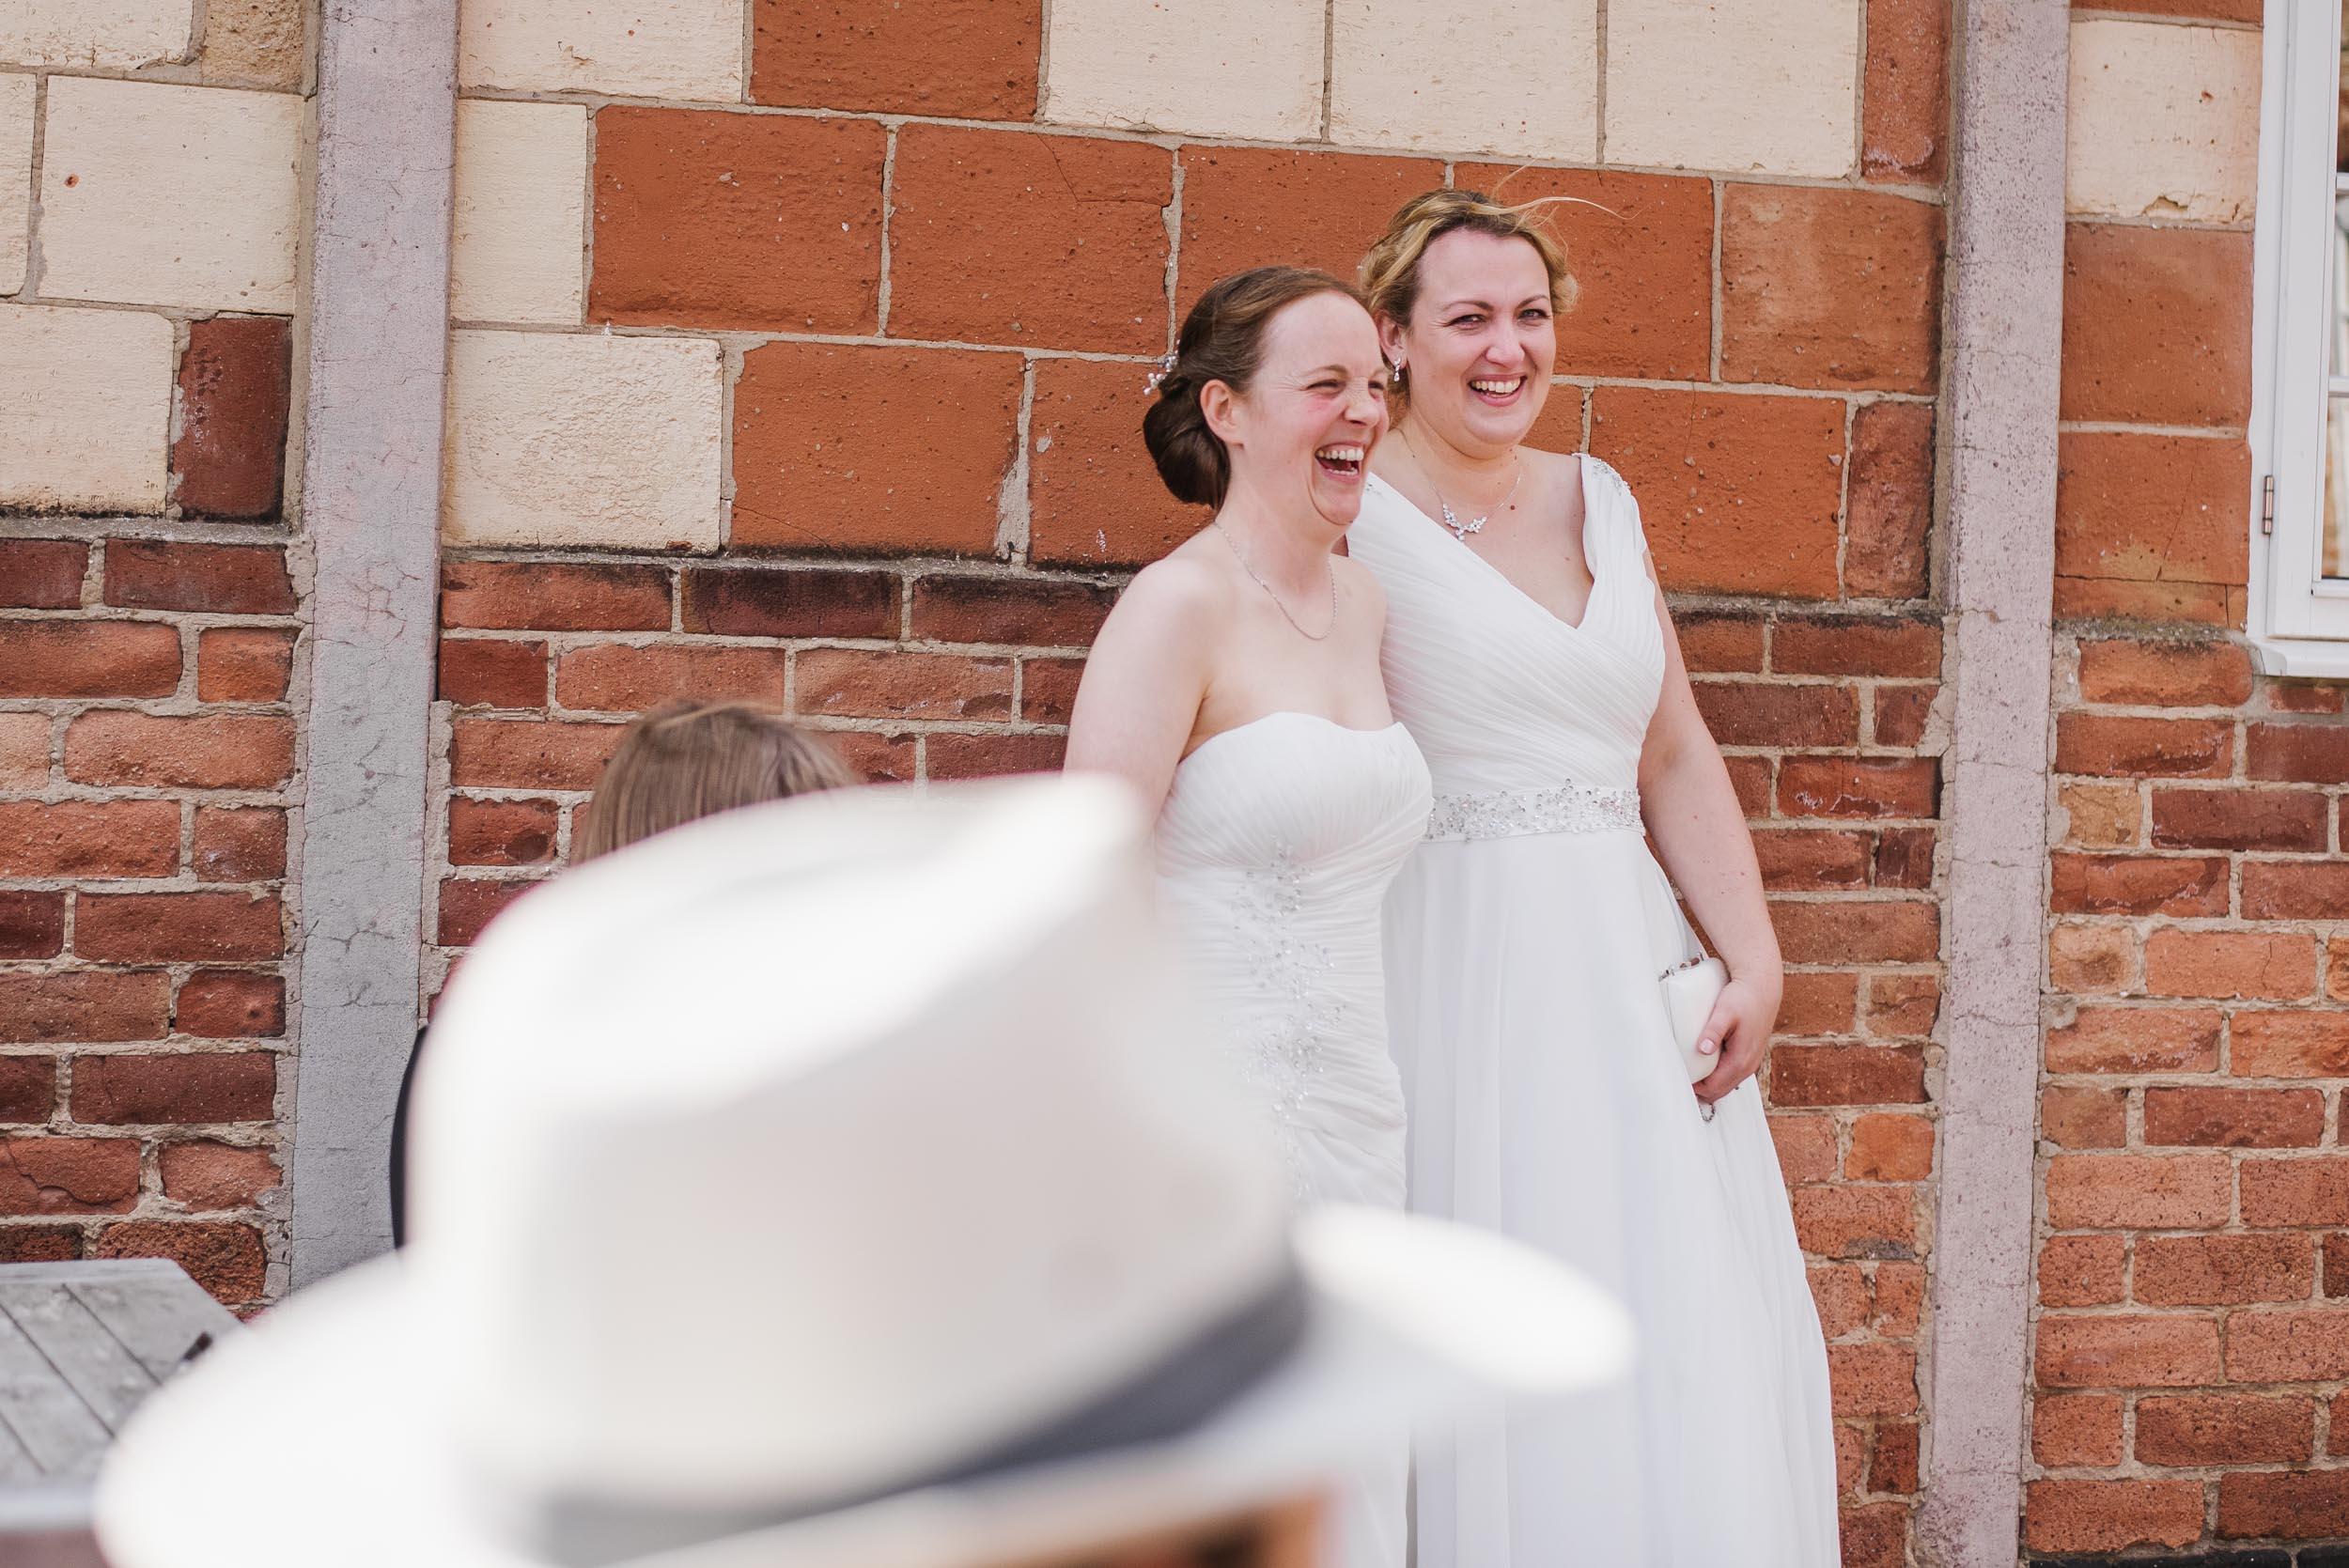 Donington-park-farm-wedding-photography-449.jpg